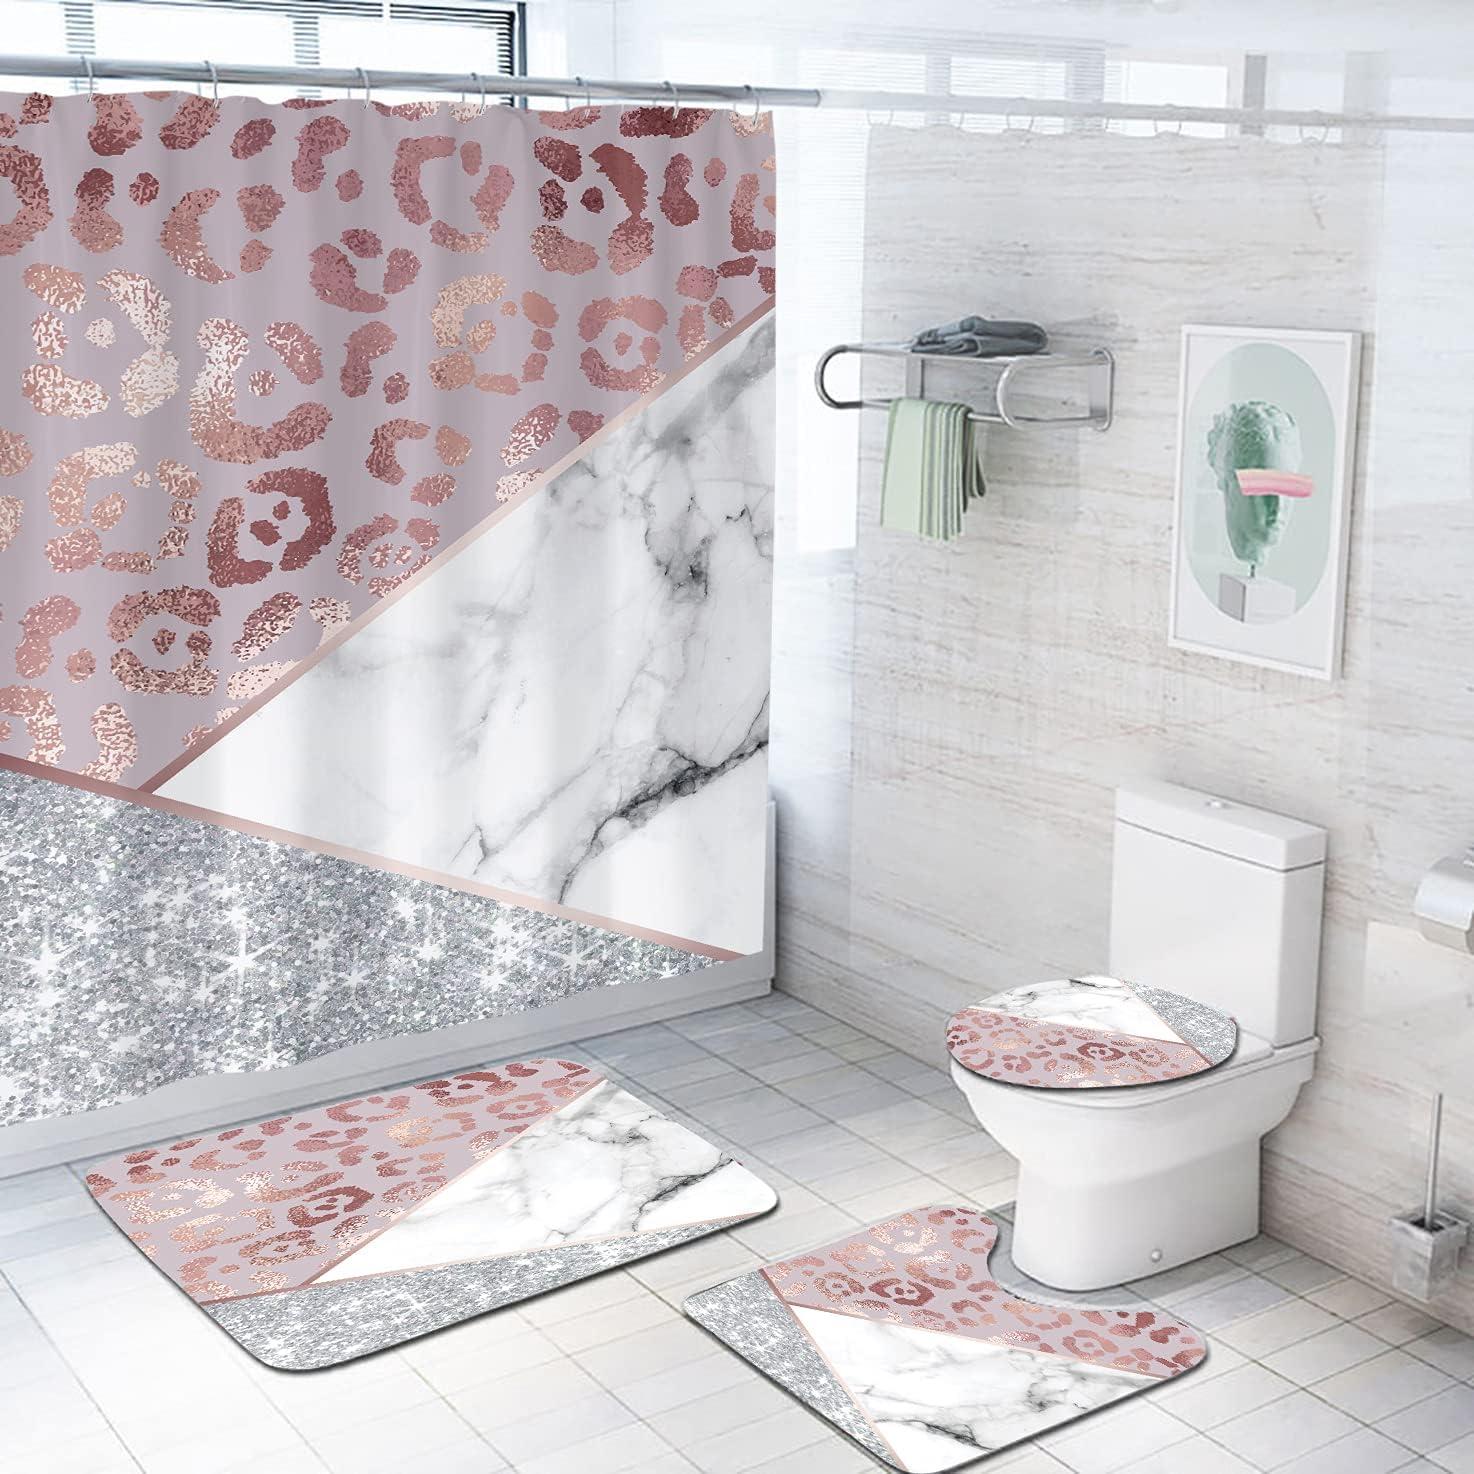 Coxila Leopard Marble Shower Curtain Sets online shopping Bath Decor P San Francisco Mall Pcs Mat 4